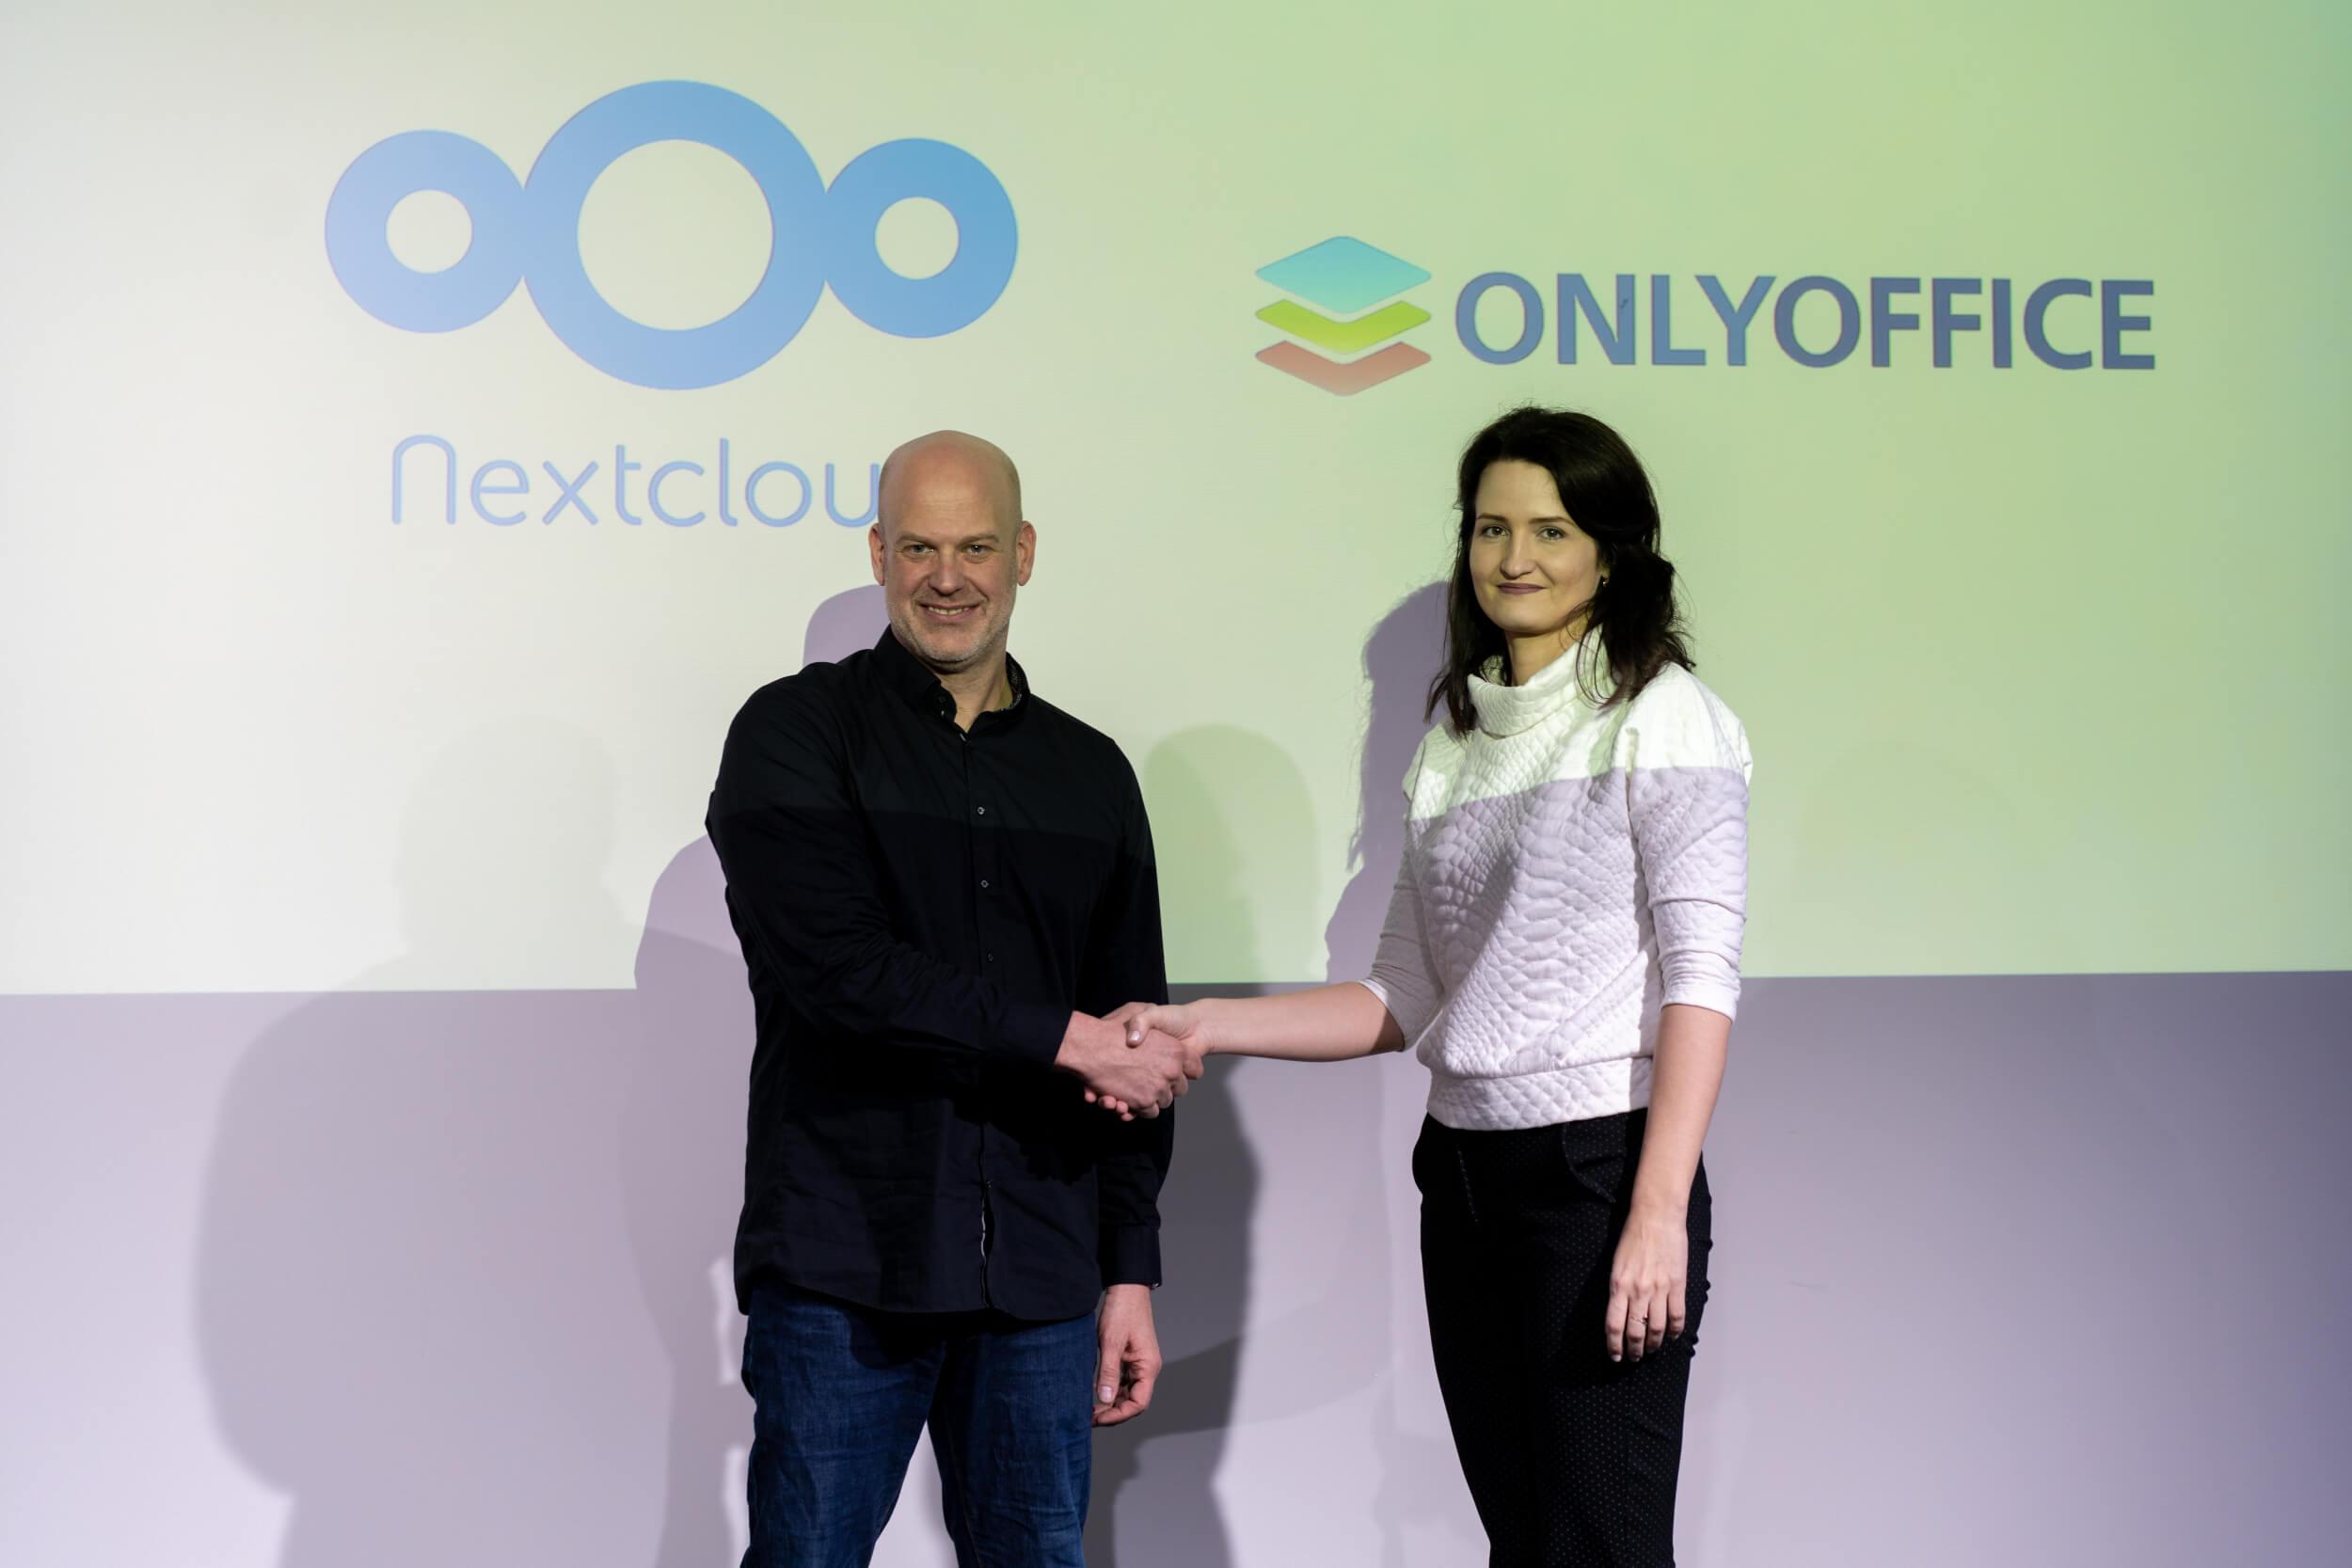 ONLYOFFICE partnership